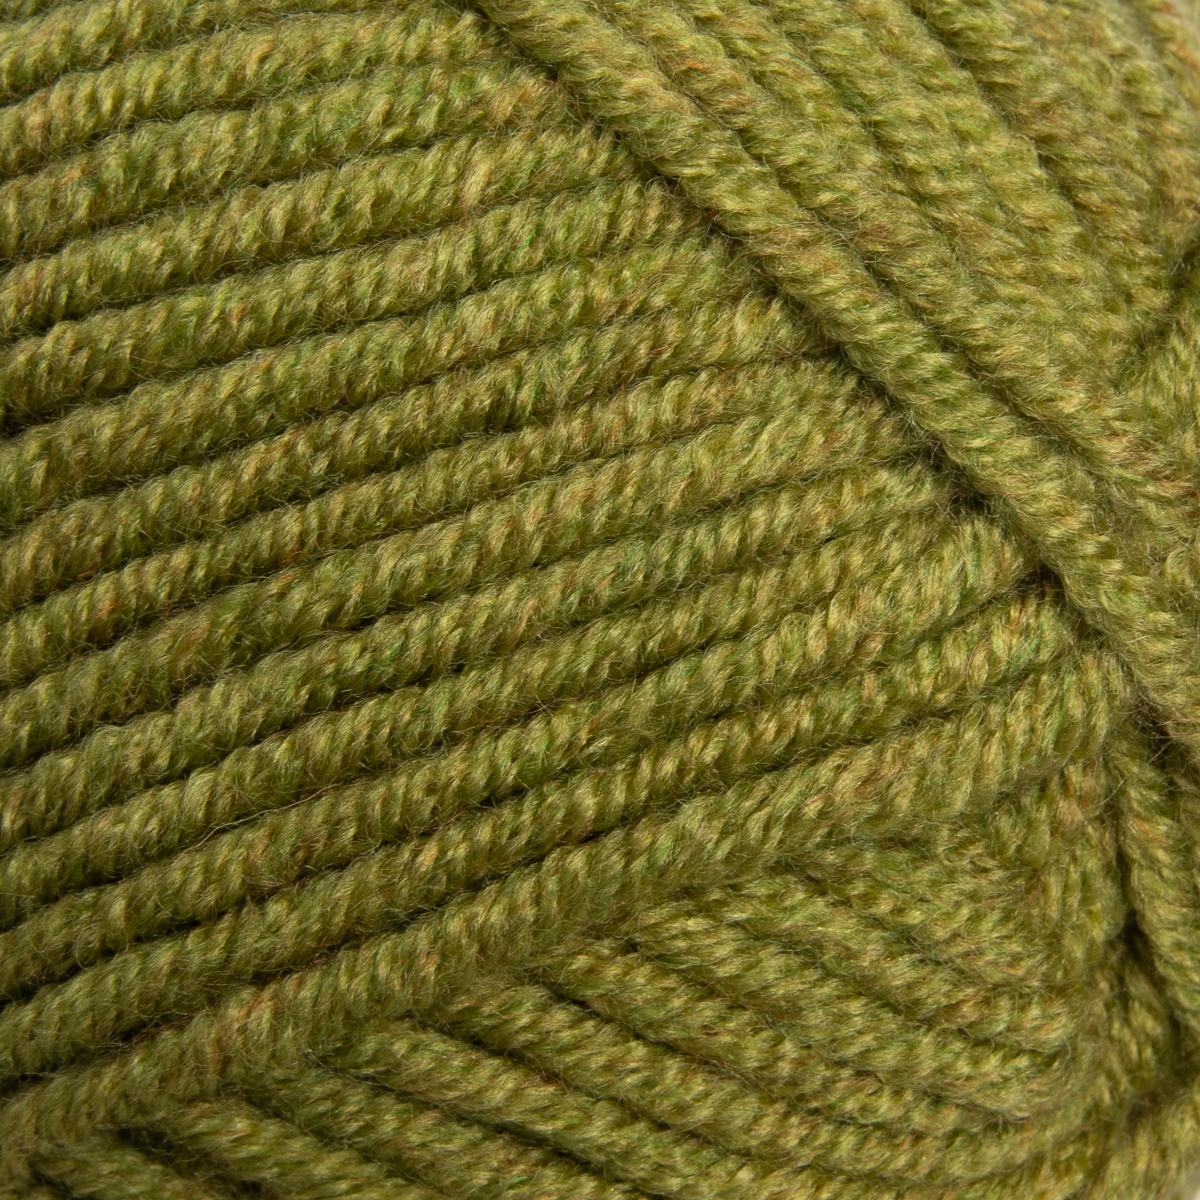 3pk-Lion-Brand-Woolspun-Acrylic-amp-Wool-Yarn-Bulky-5-Knit-Crocheting-Skeins-Soft thumbnail 19